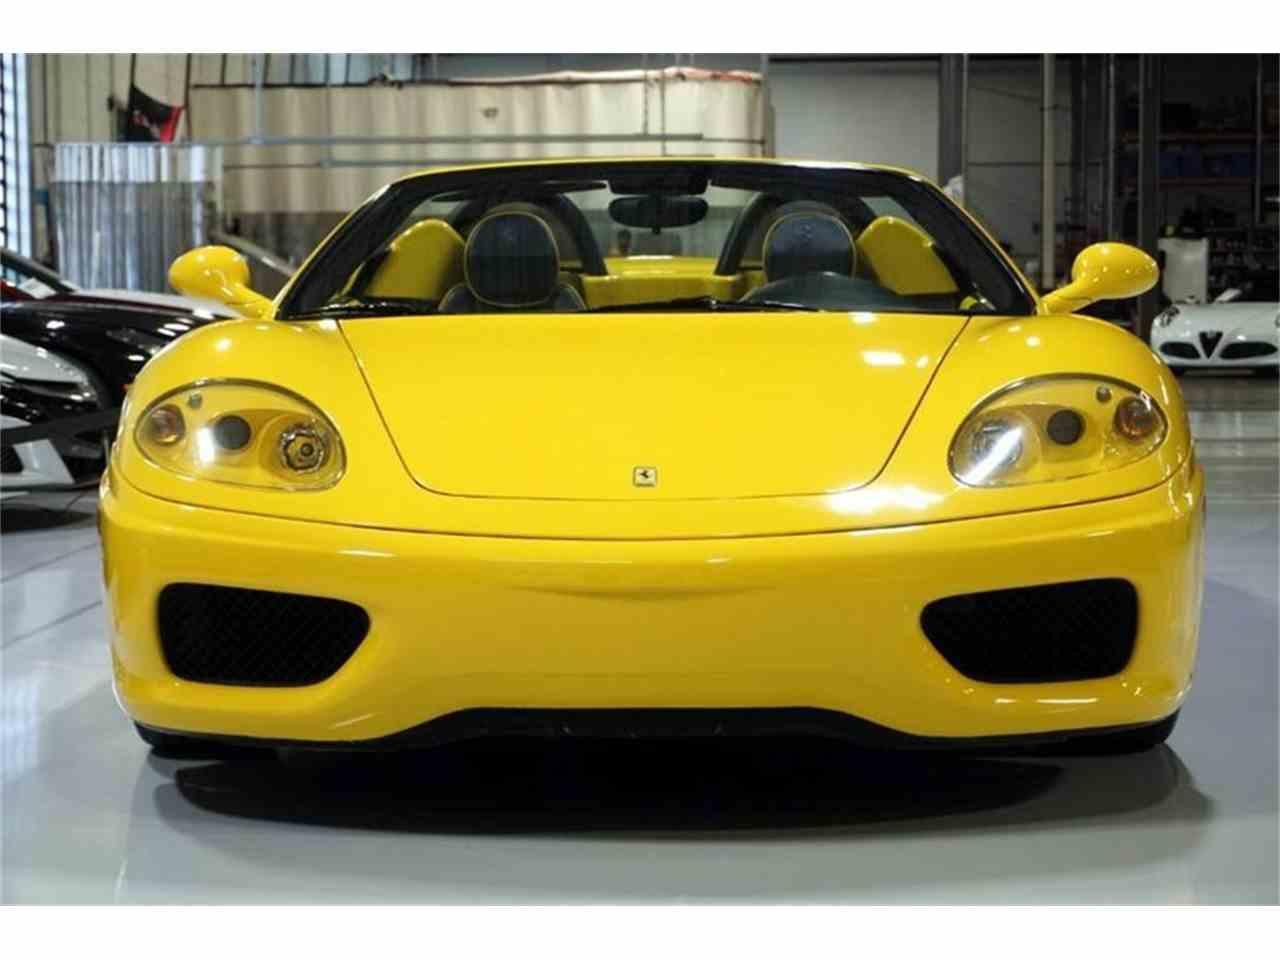 Large Picture of 2004 360 located in Solon Ohio - $99,999.00 - MC5X